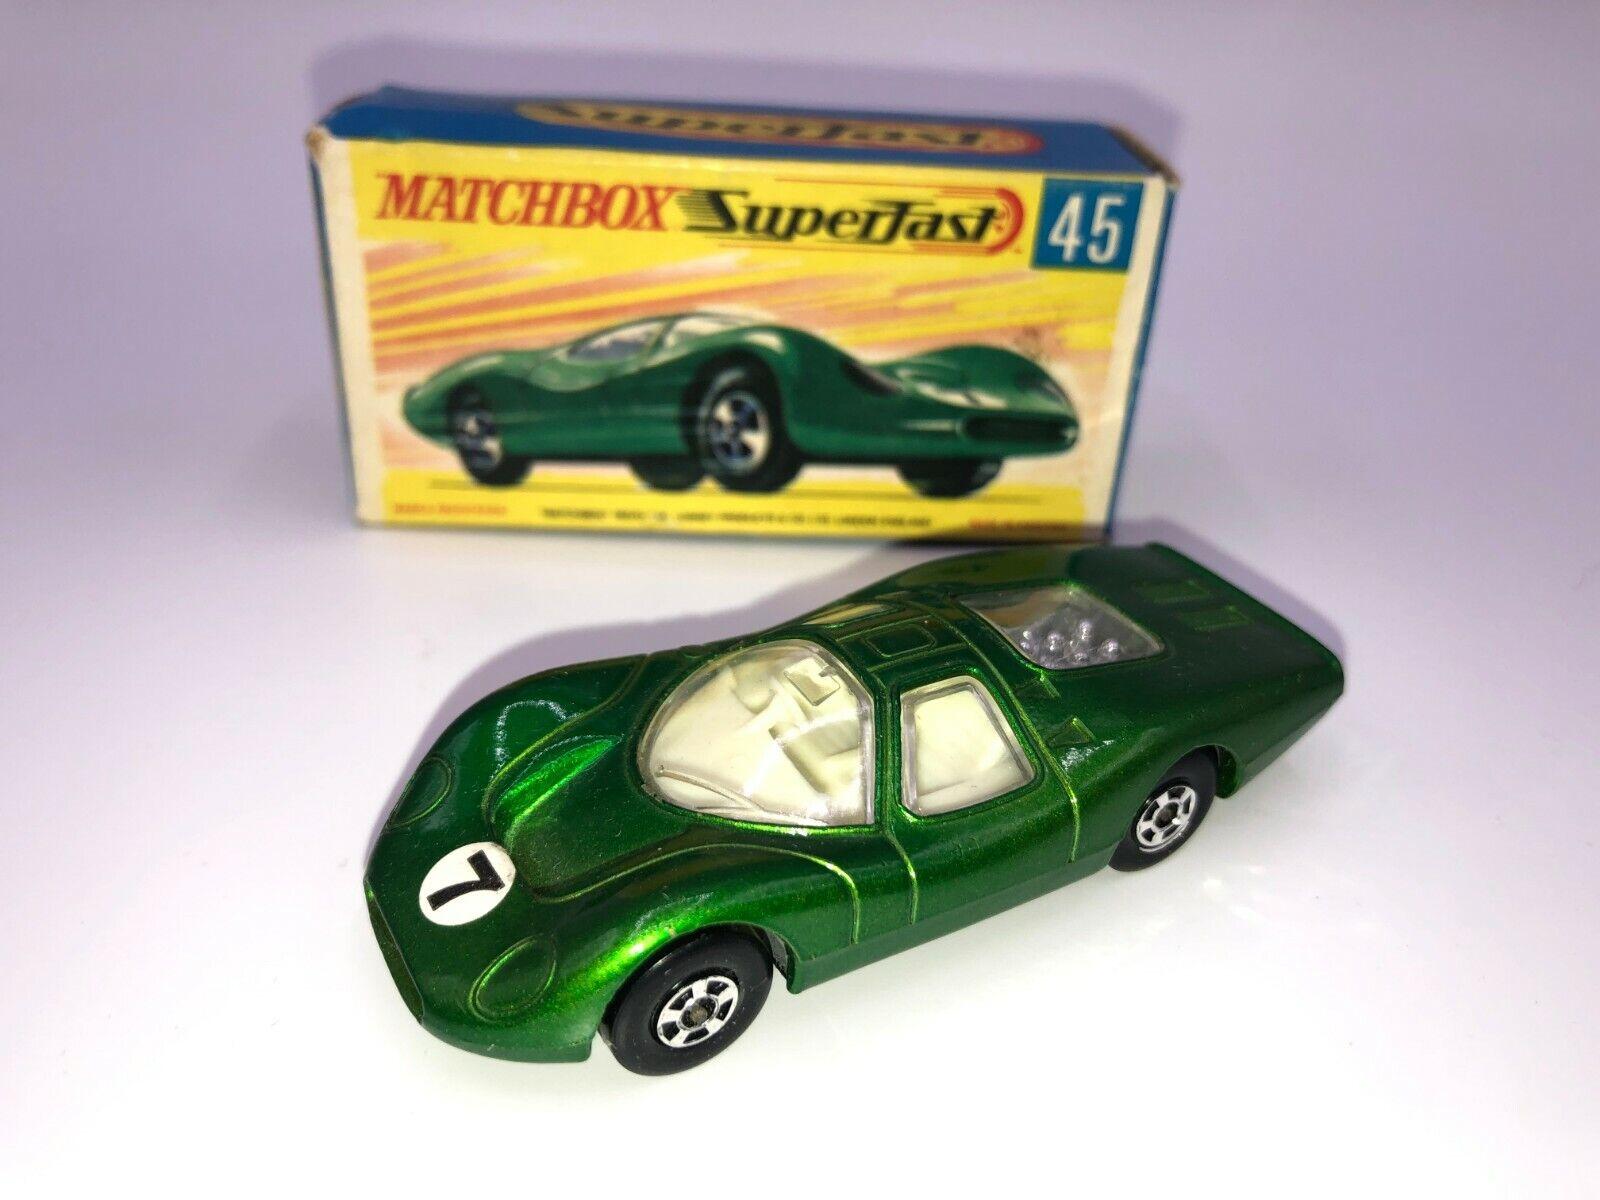 100% precio garantizado Matchbox súperfast  45 verde verde verde Ford grupo 6, Negro Base en caja original de G2  almacén al por mayor